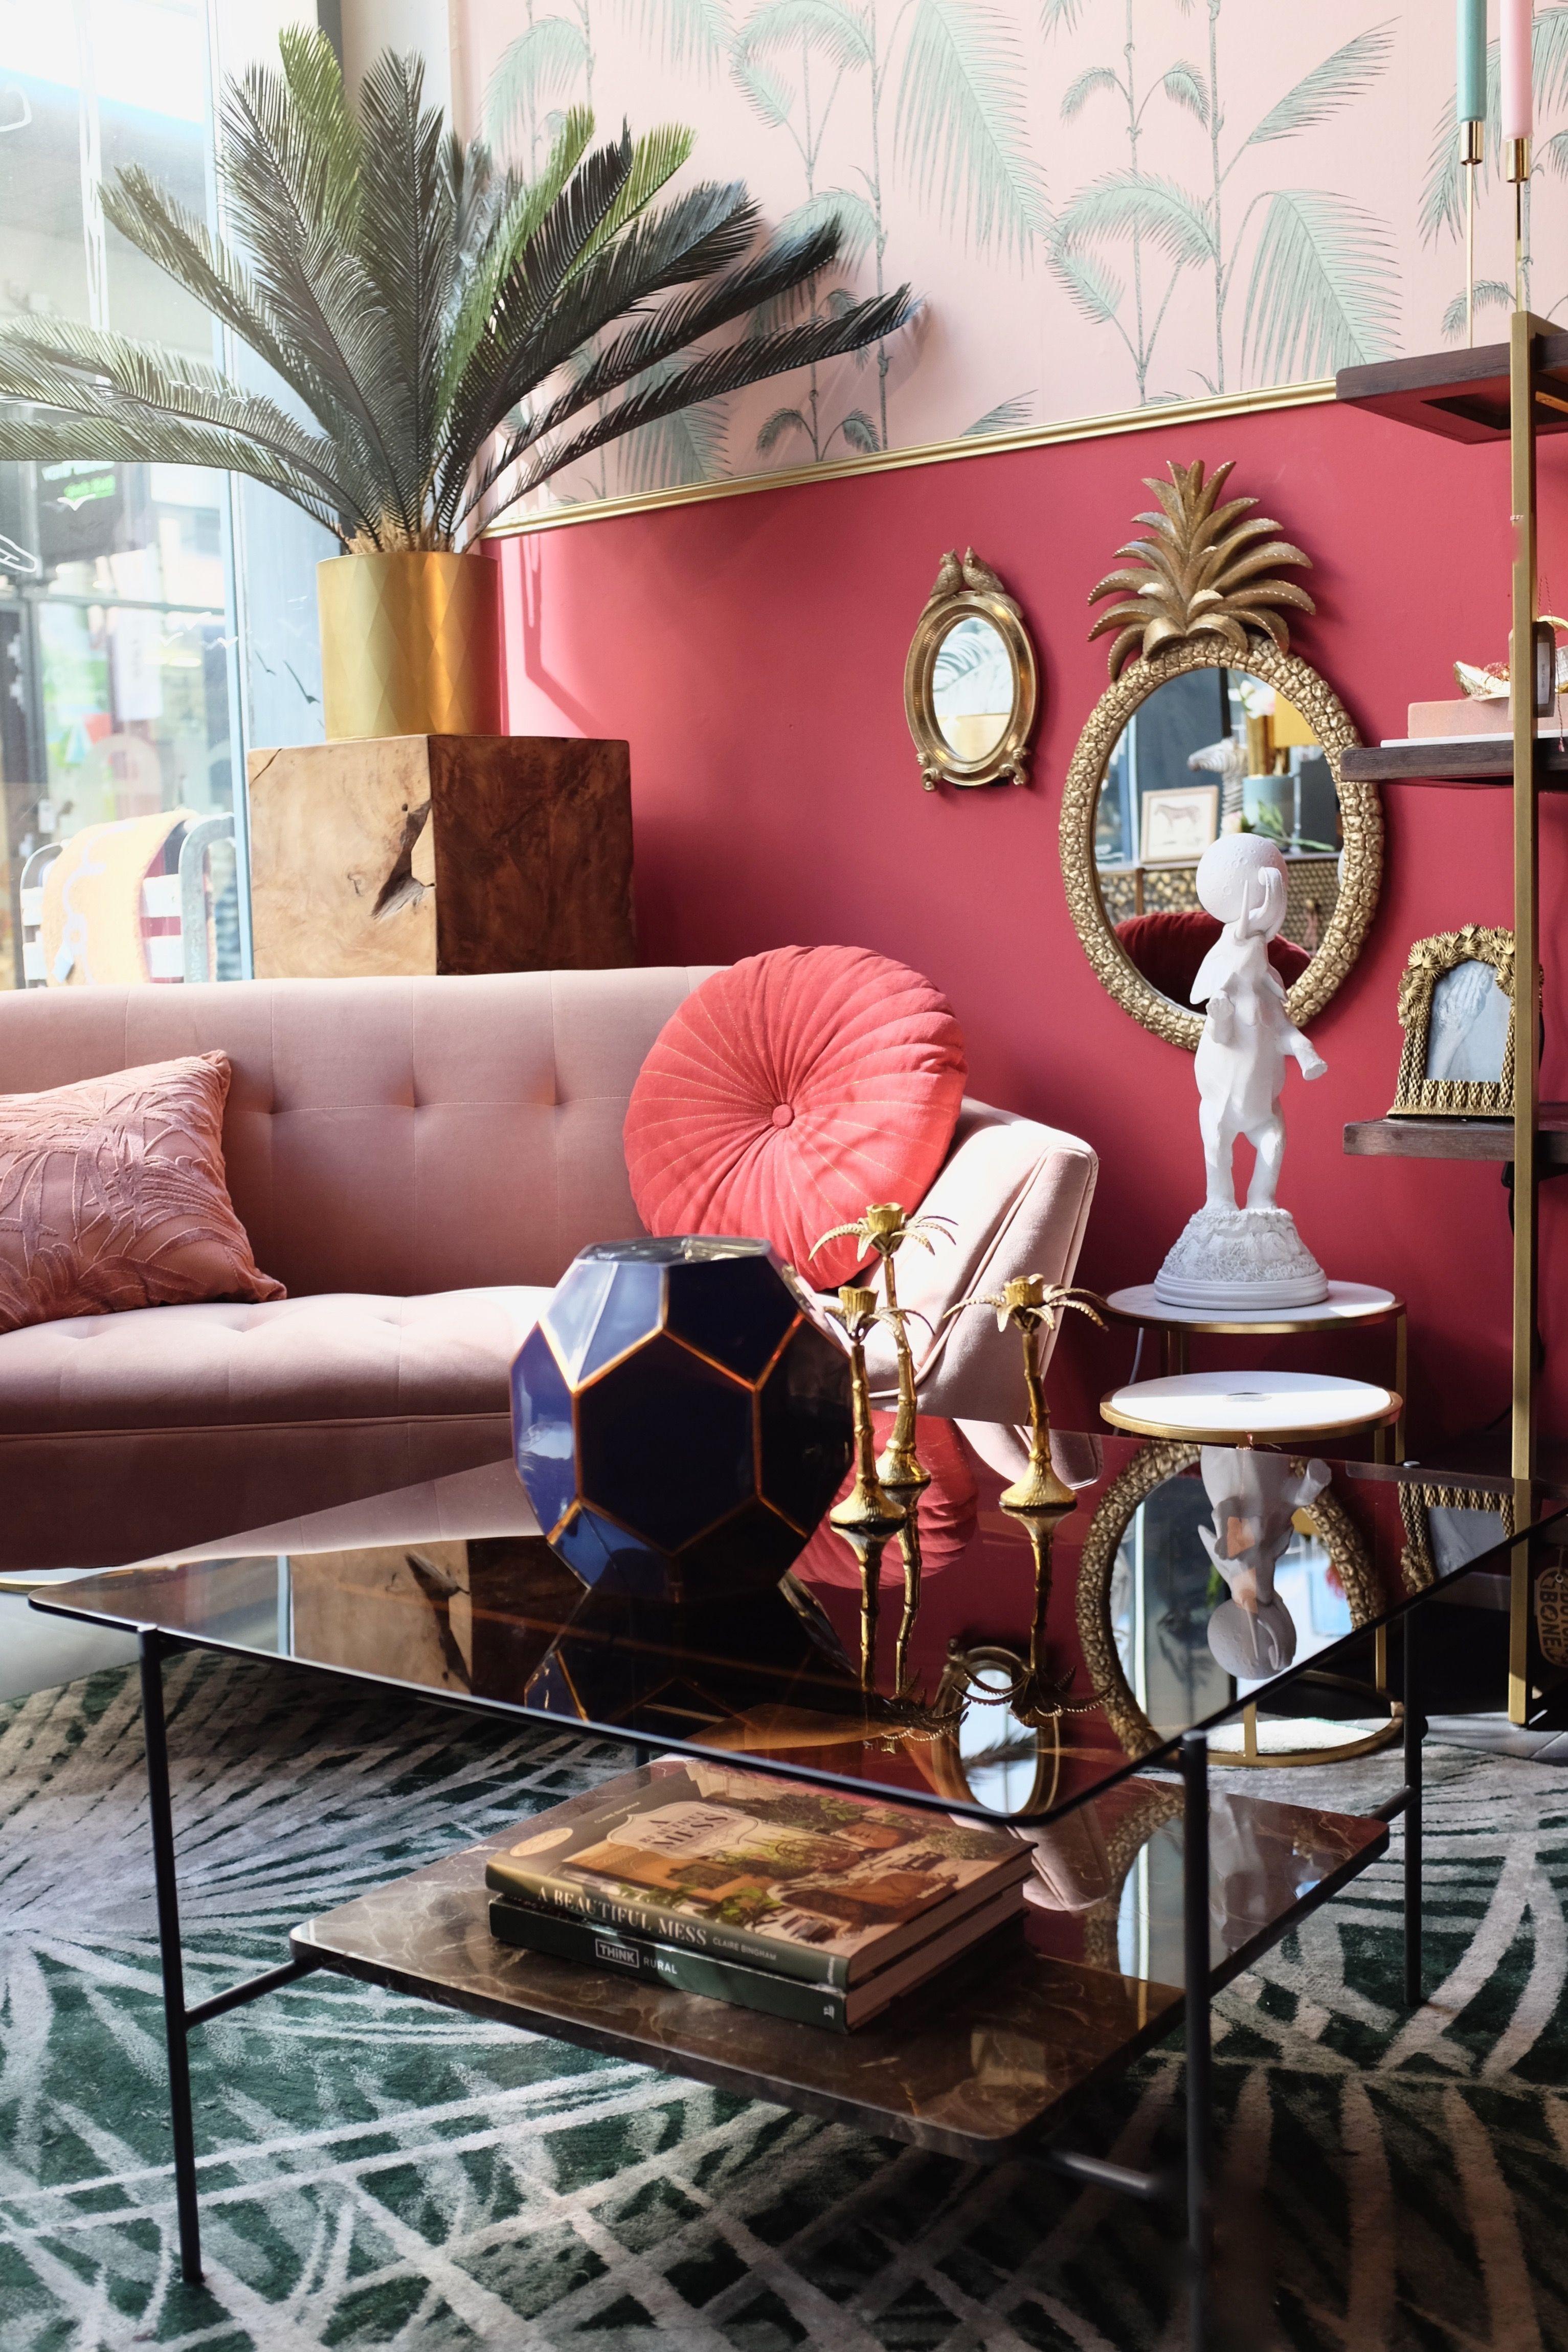 Home Interior Vintage #homestock #interiorshop #miniwarehouse